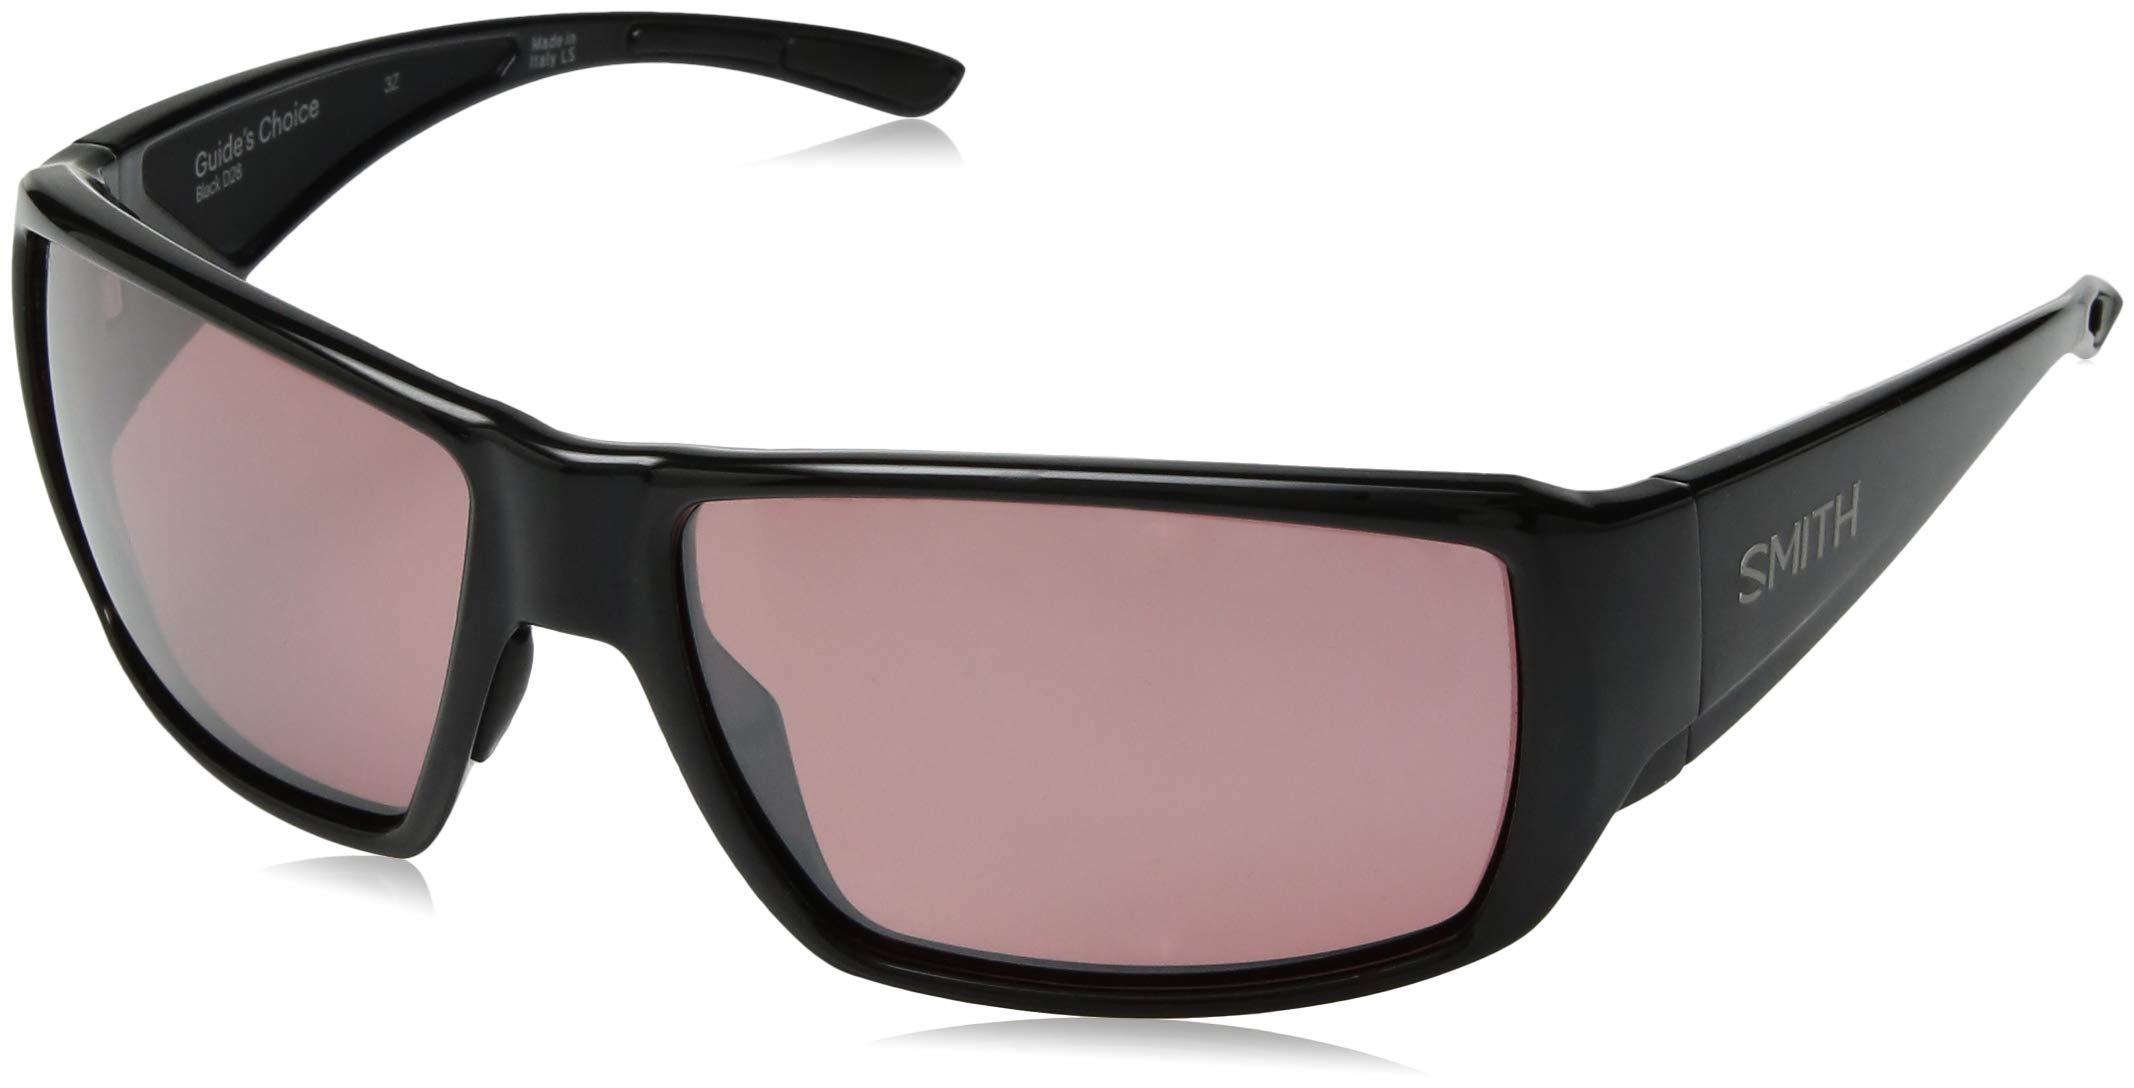 5414b157b7 Buyr.com - Smith Guides Choice ChromaPop Polarized Sunglasses